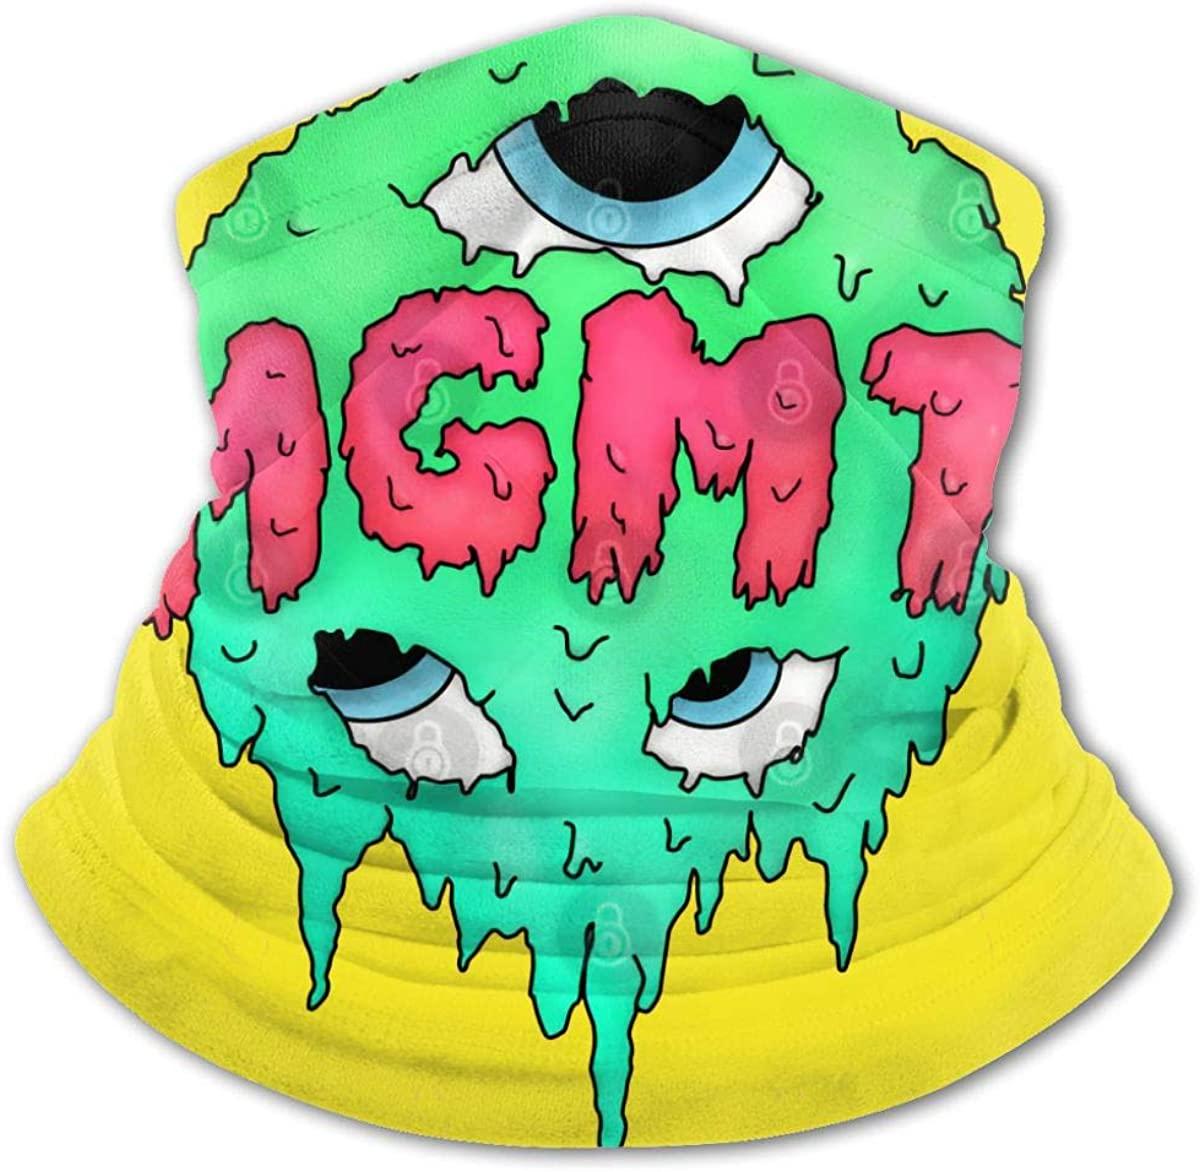 MGMT Face Mask Balaclava Protection from Dust, Uv & Aerosols - Reusable Bandana Face Cover Black